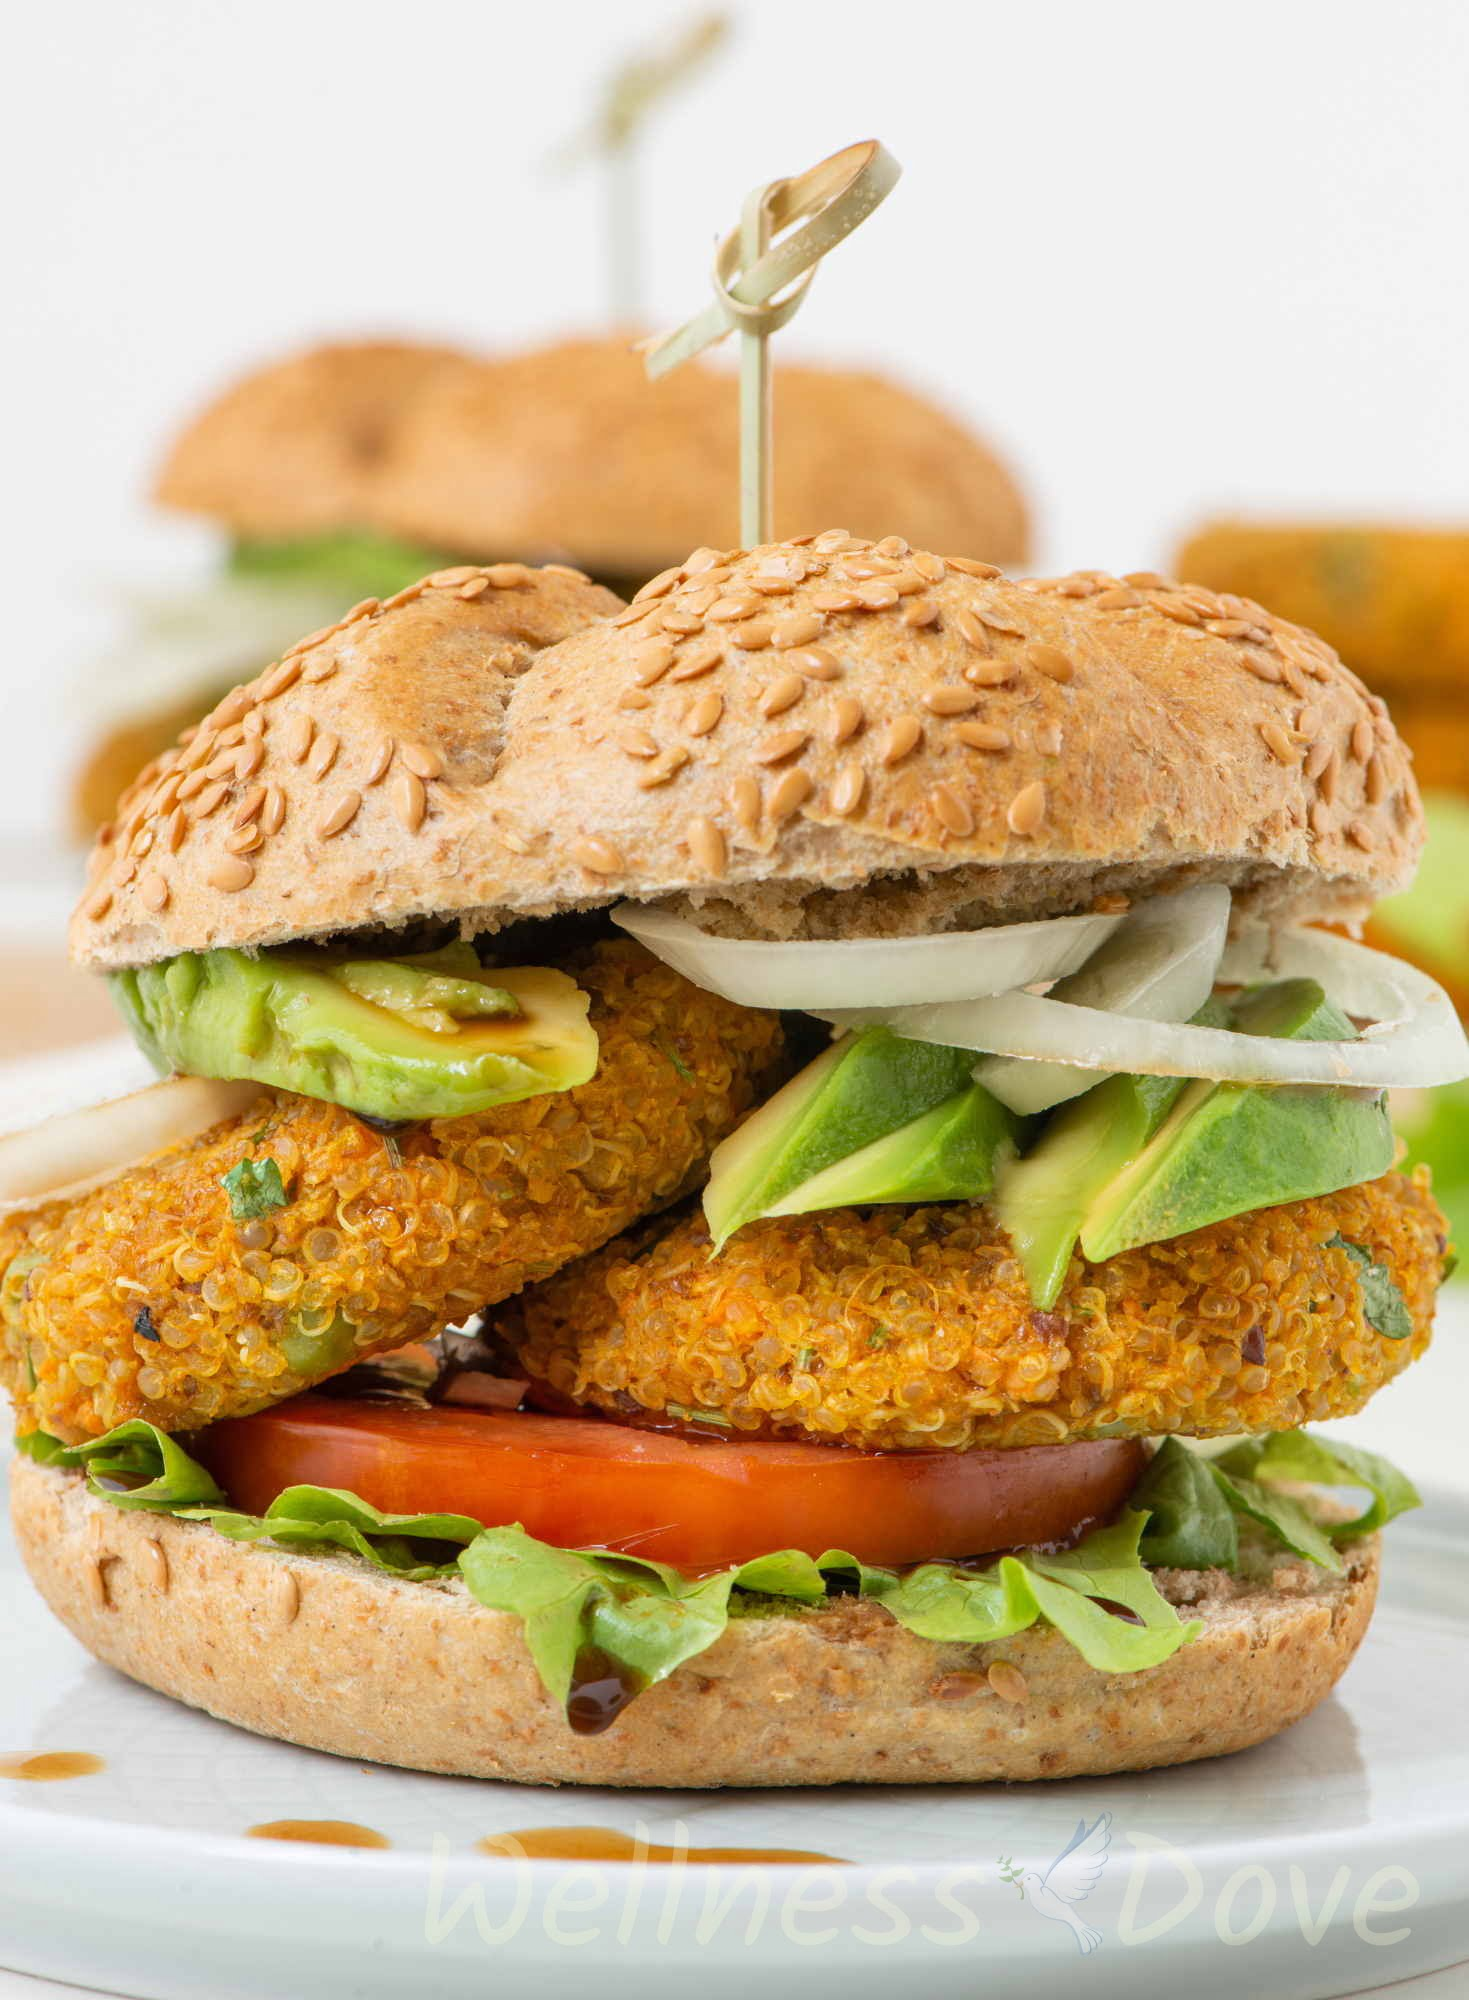 The vegan burger  on a plate, macro